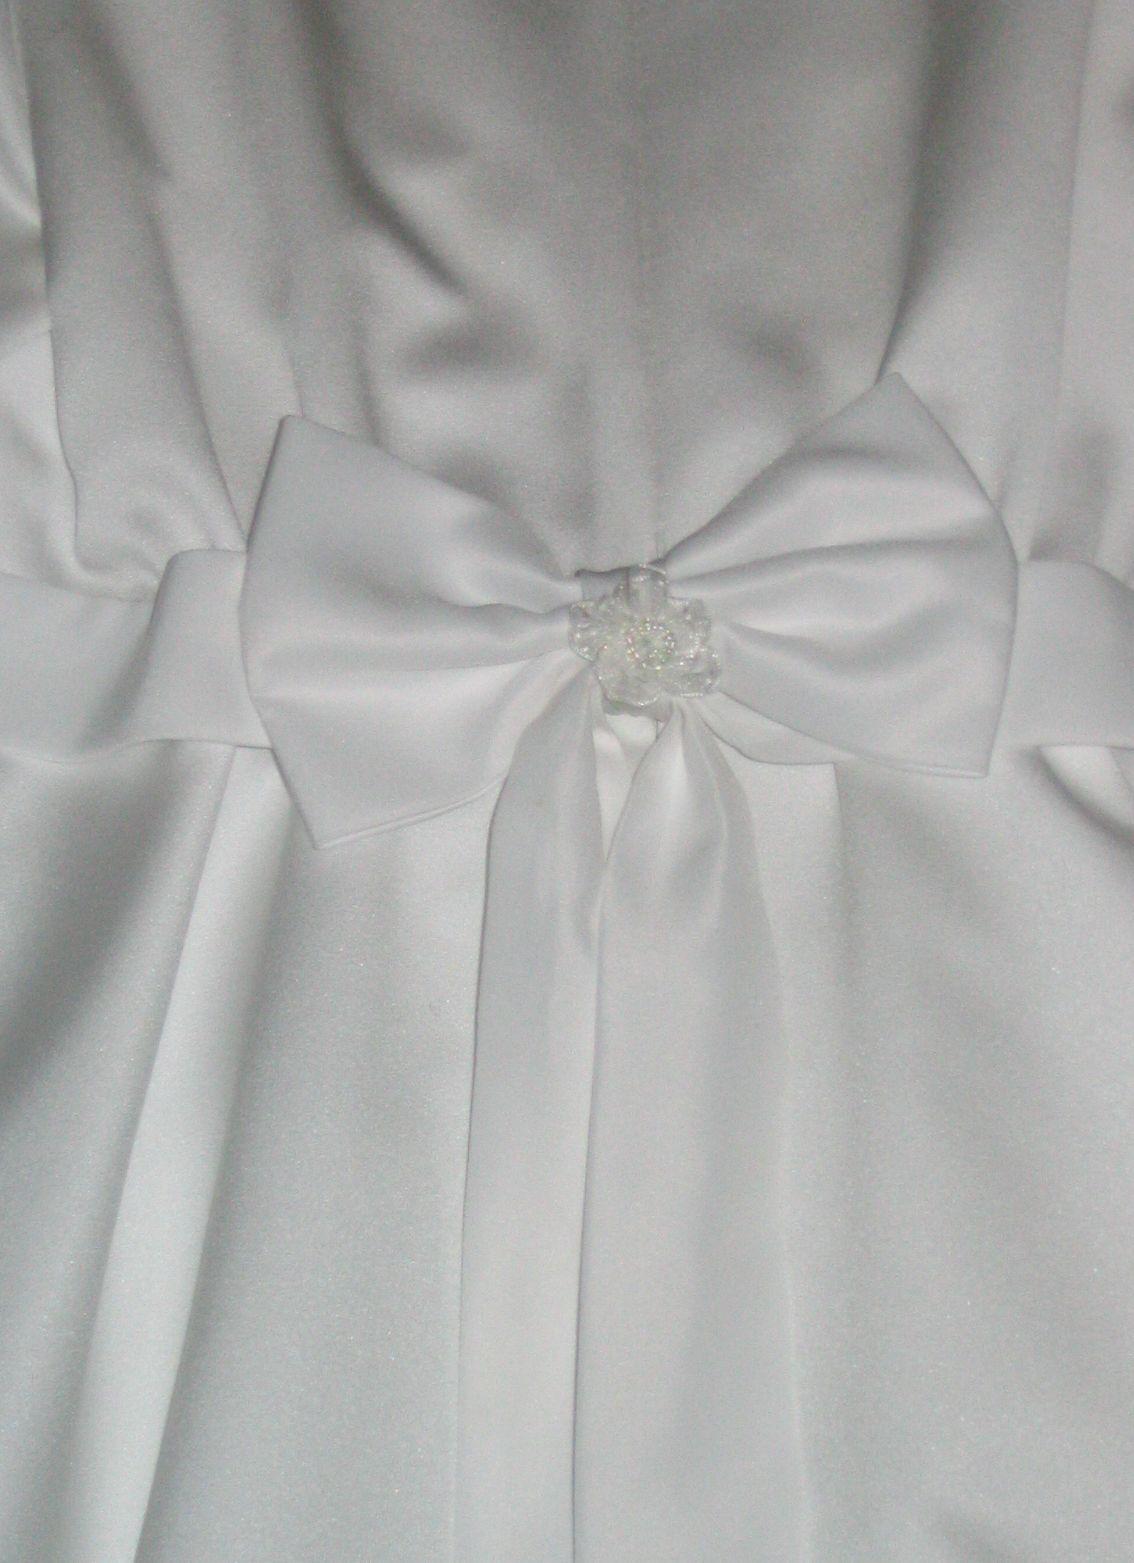 f452da3d66 122-128 sukienka komunijna WARSZAWA - 7064252687 - oficjalne ...